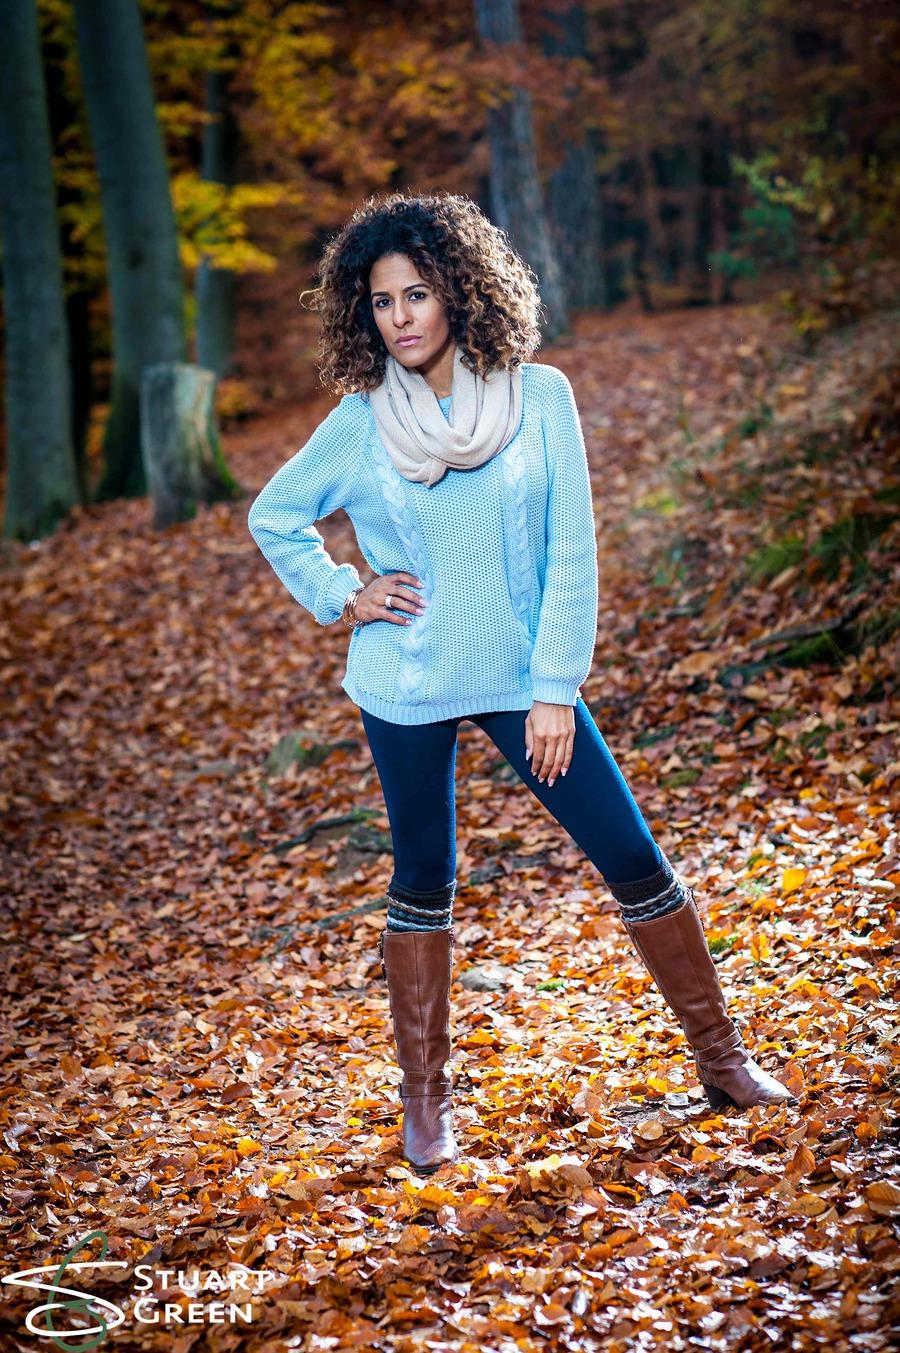 KATY / Photography by Stuart Green-Photography / Uploaded 10th November 2015 @ 09:34 PM